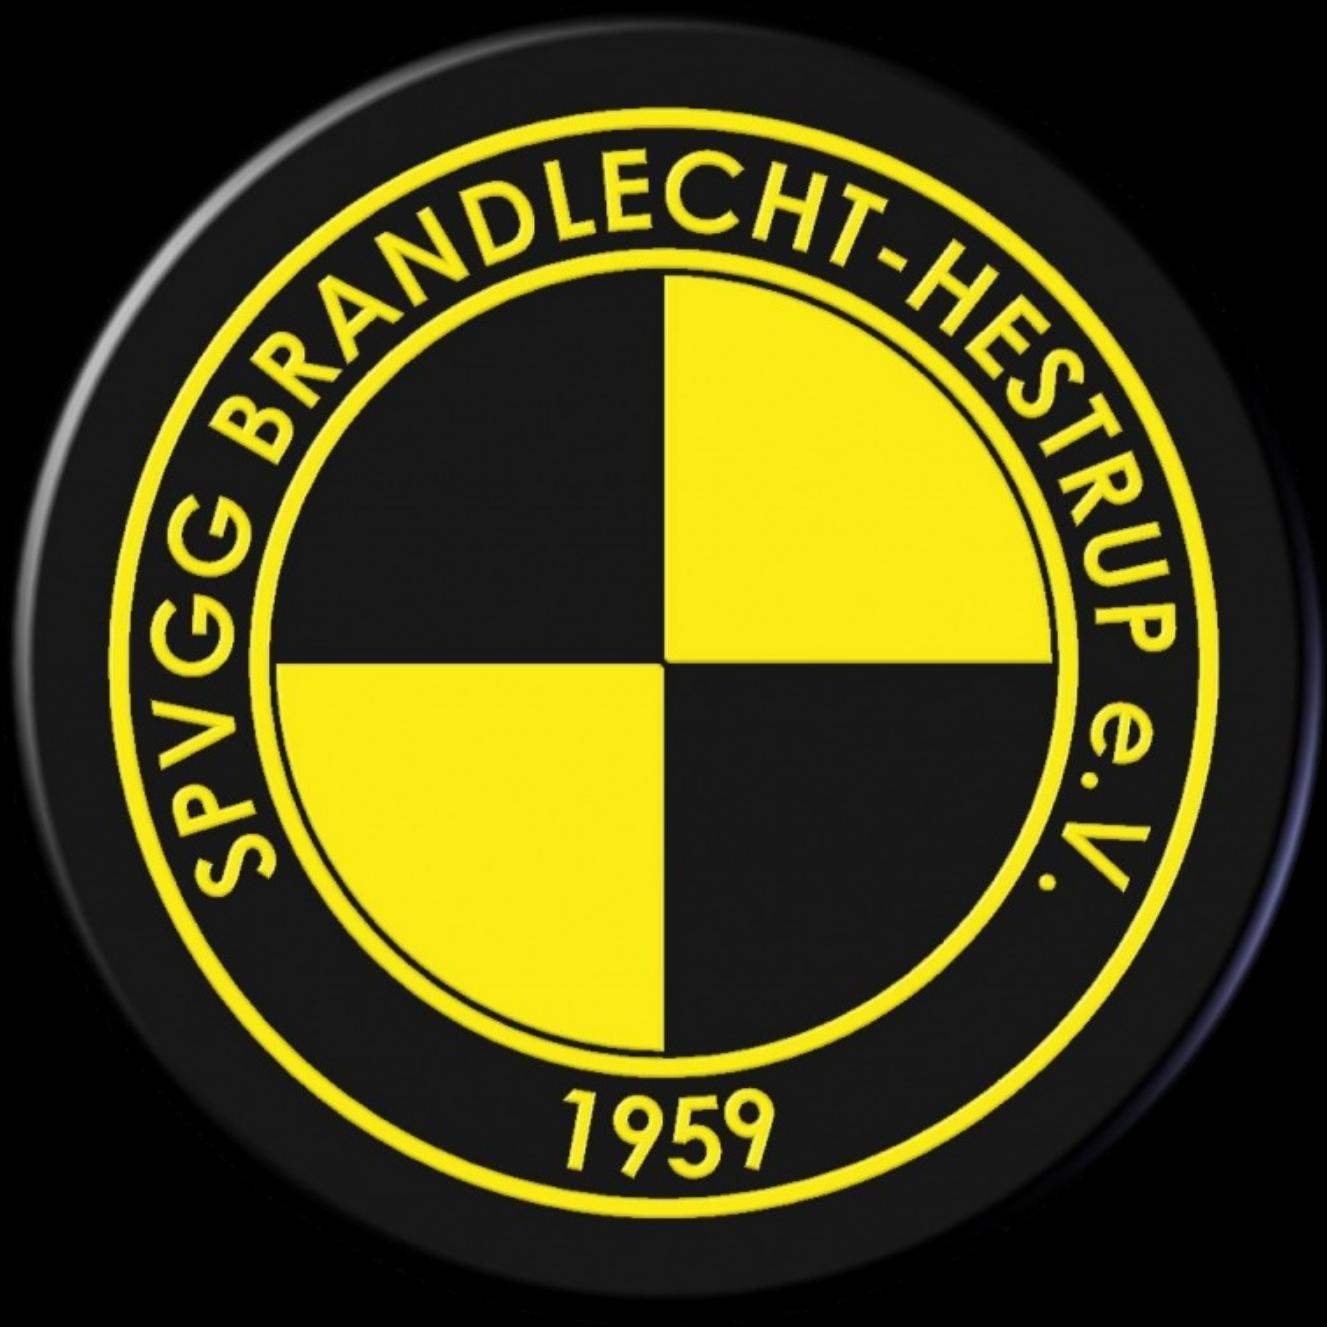 JSG Brandl./Hesepe U15